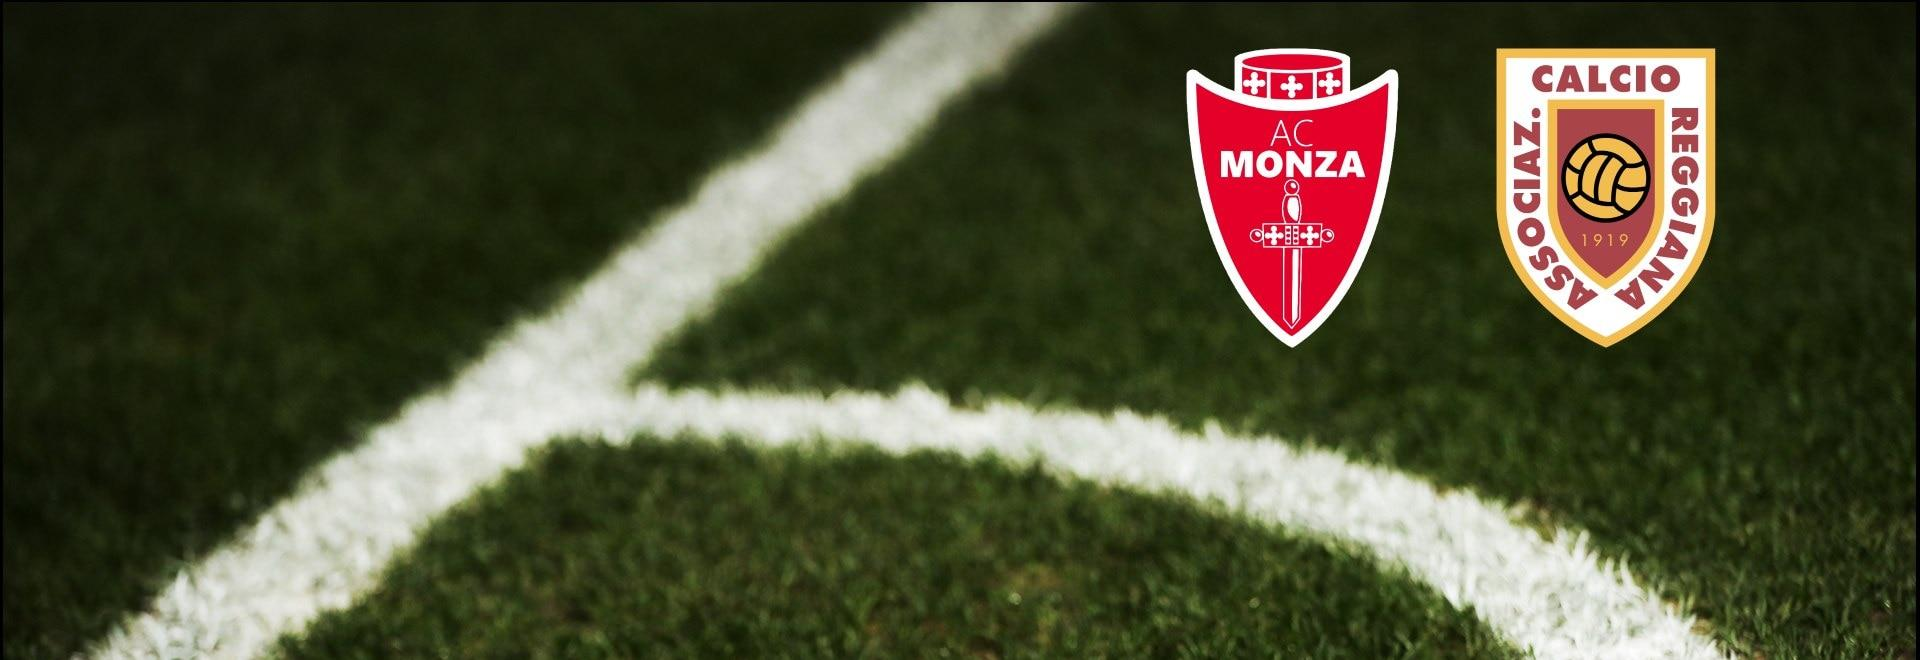 Monza - Reggiana. 29a g.